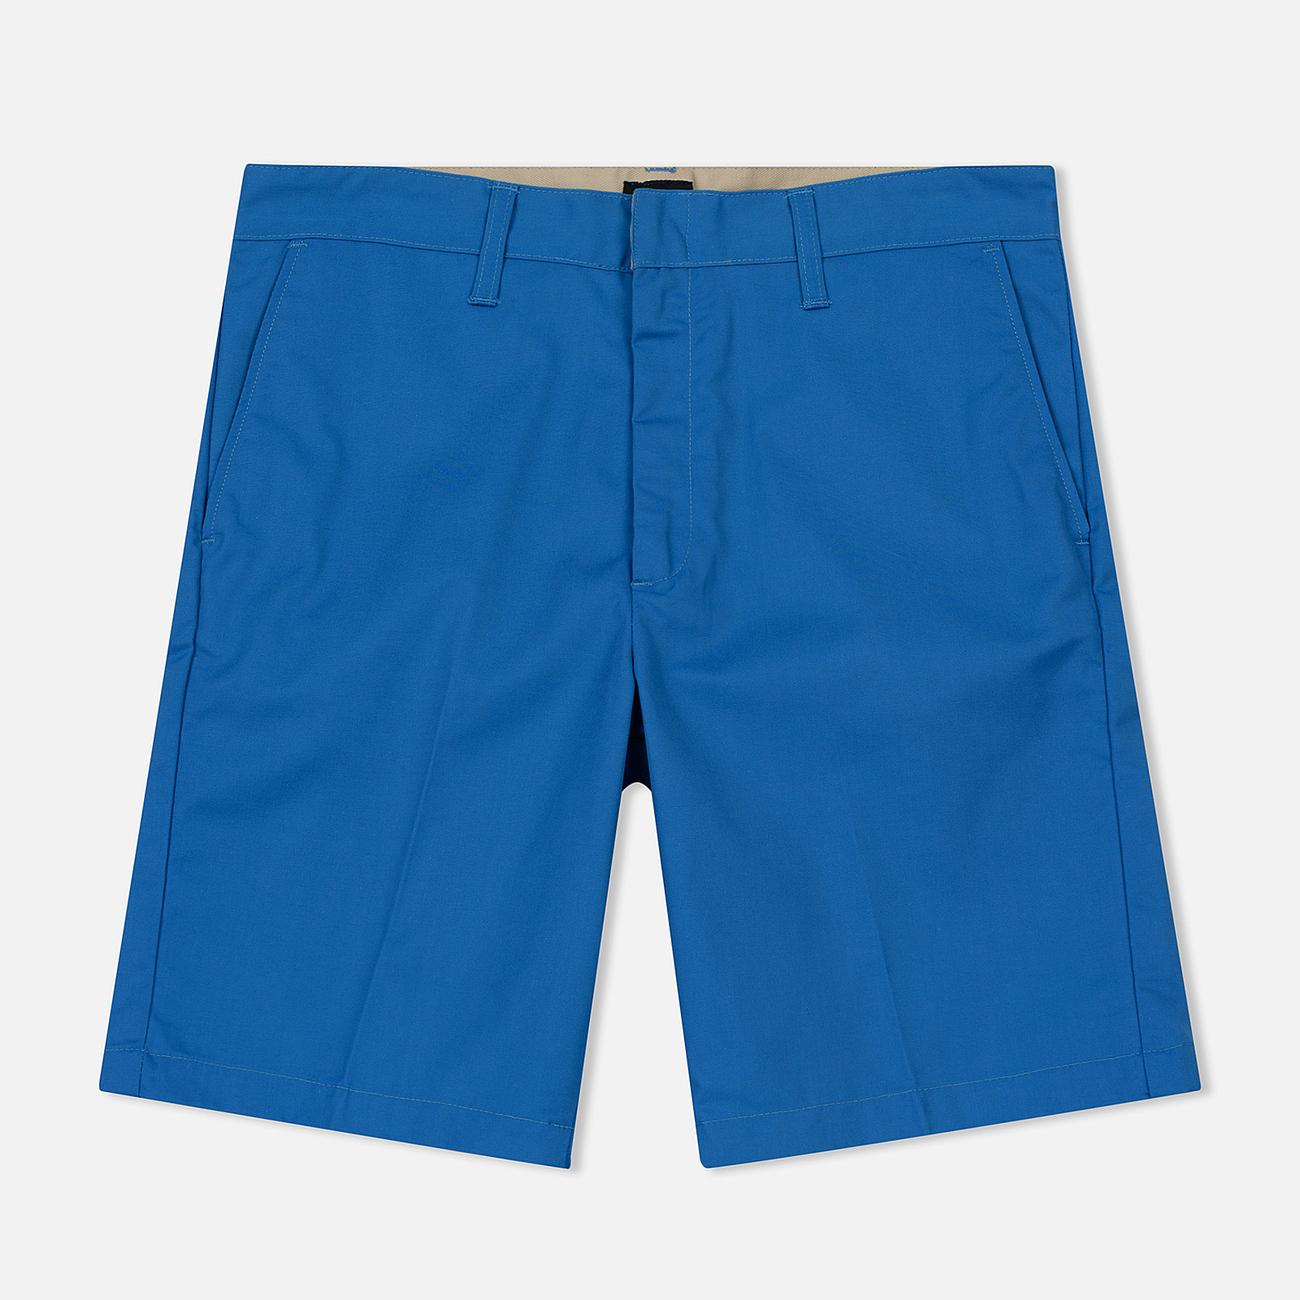 Мужские шорты Edwin Zoot Bermuda Light Polycotton Twill 6.2 Oz Blade Blue Unwashed